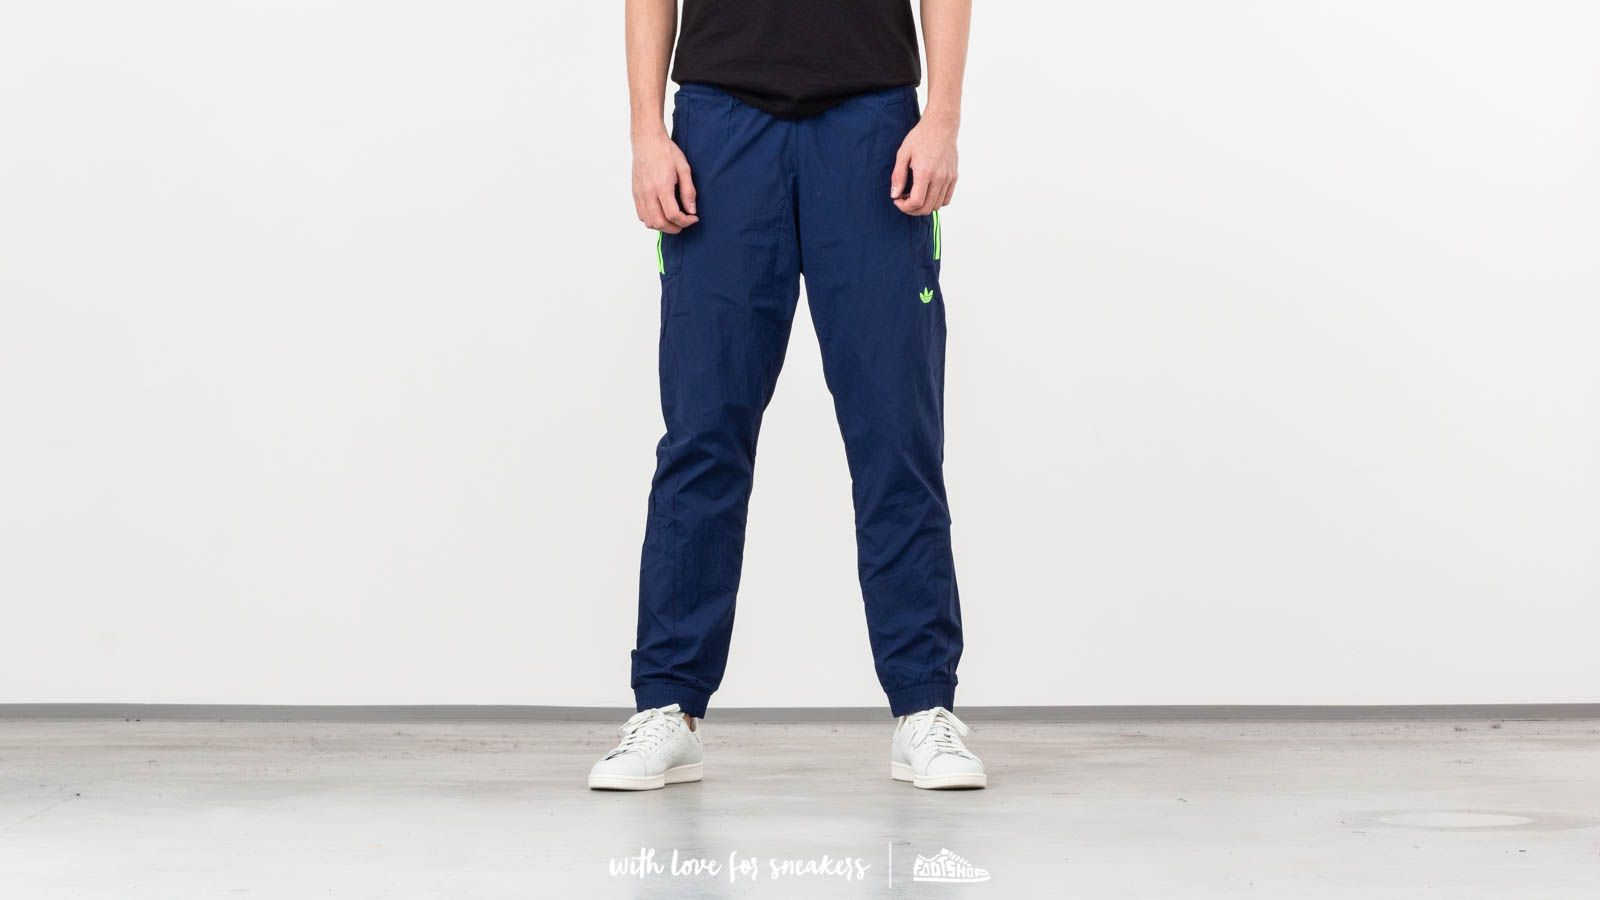 adidas Flamestrike Track Pants Blue at a great price 153 лв купете в Footshop